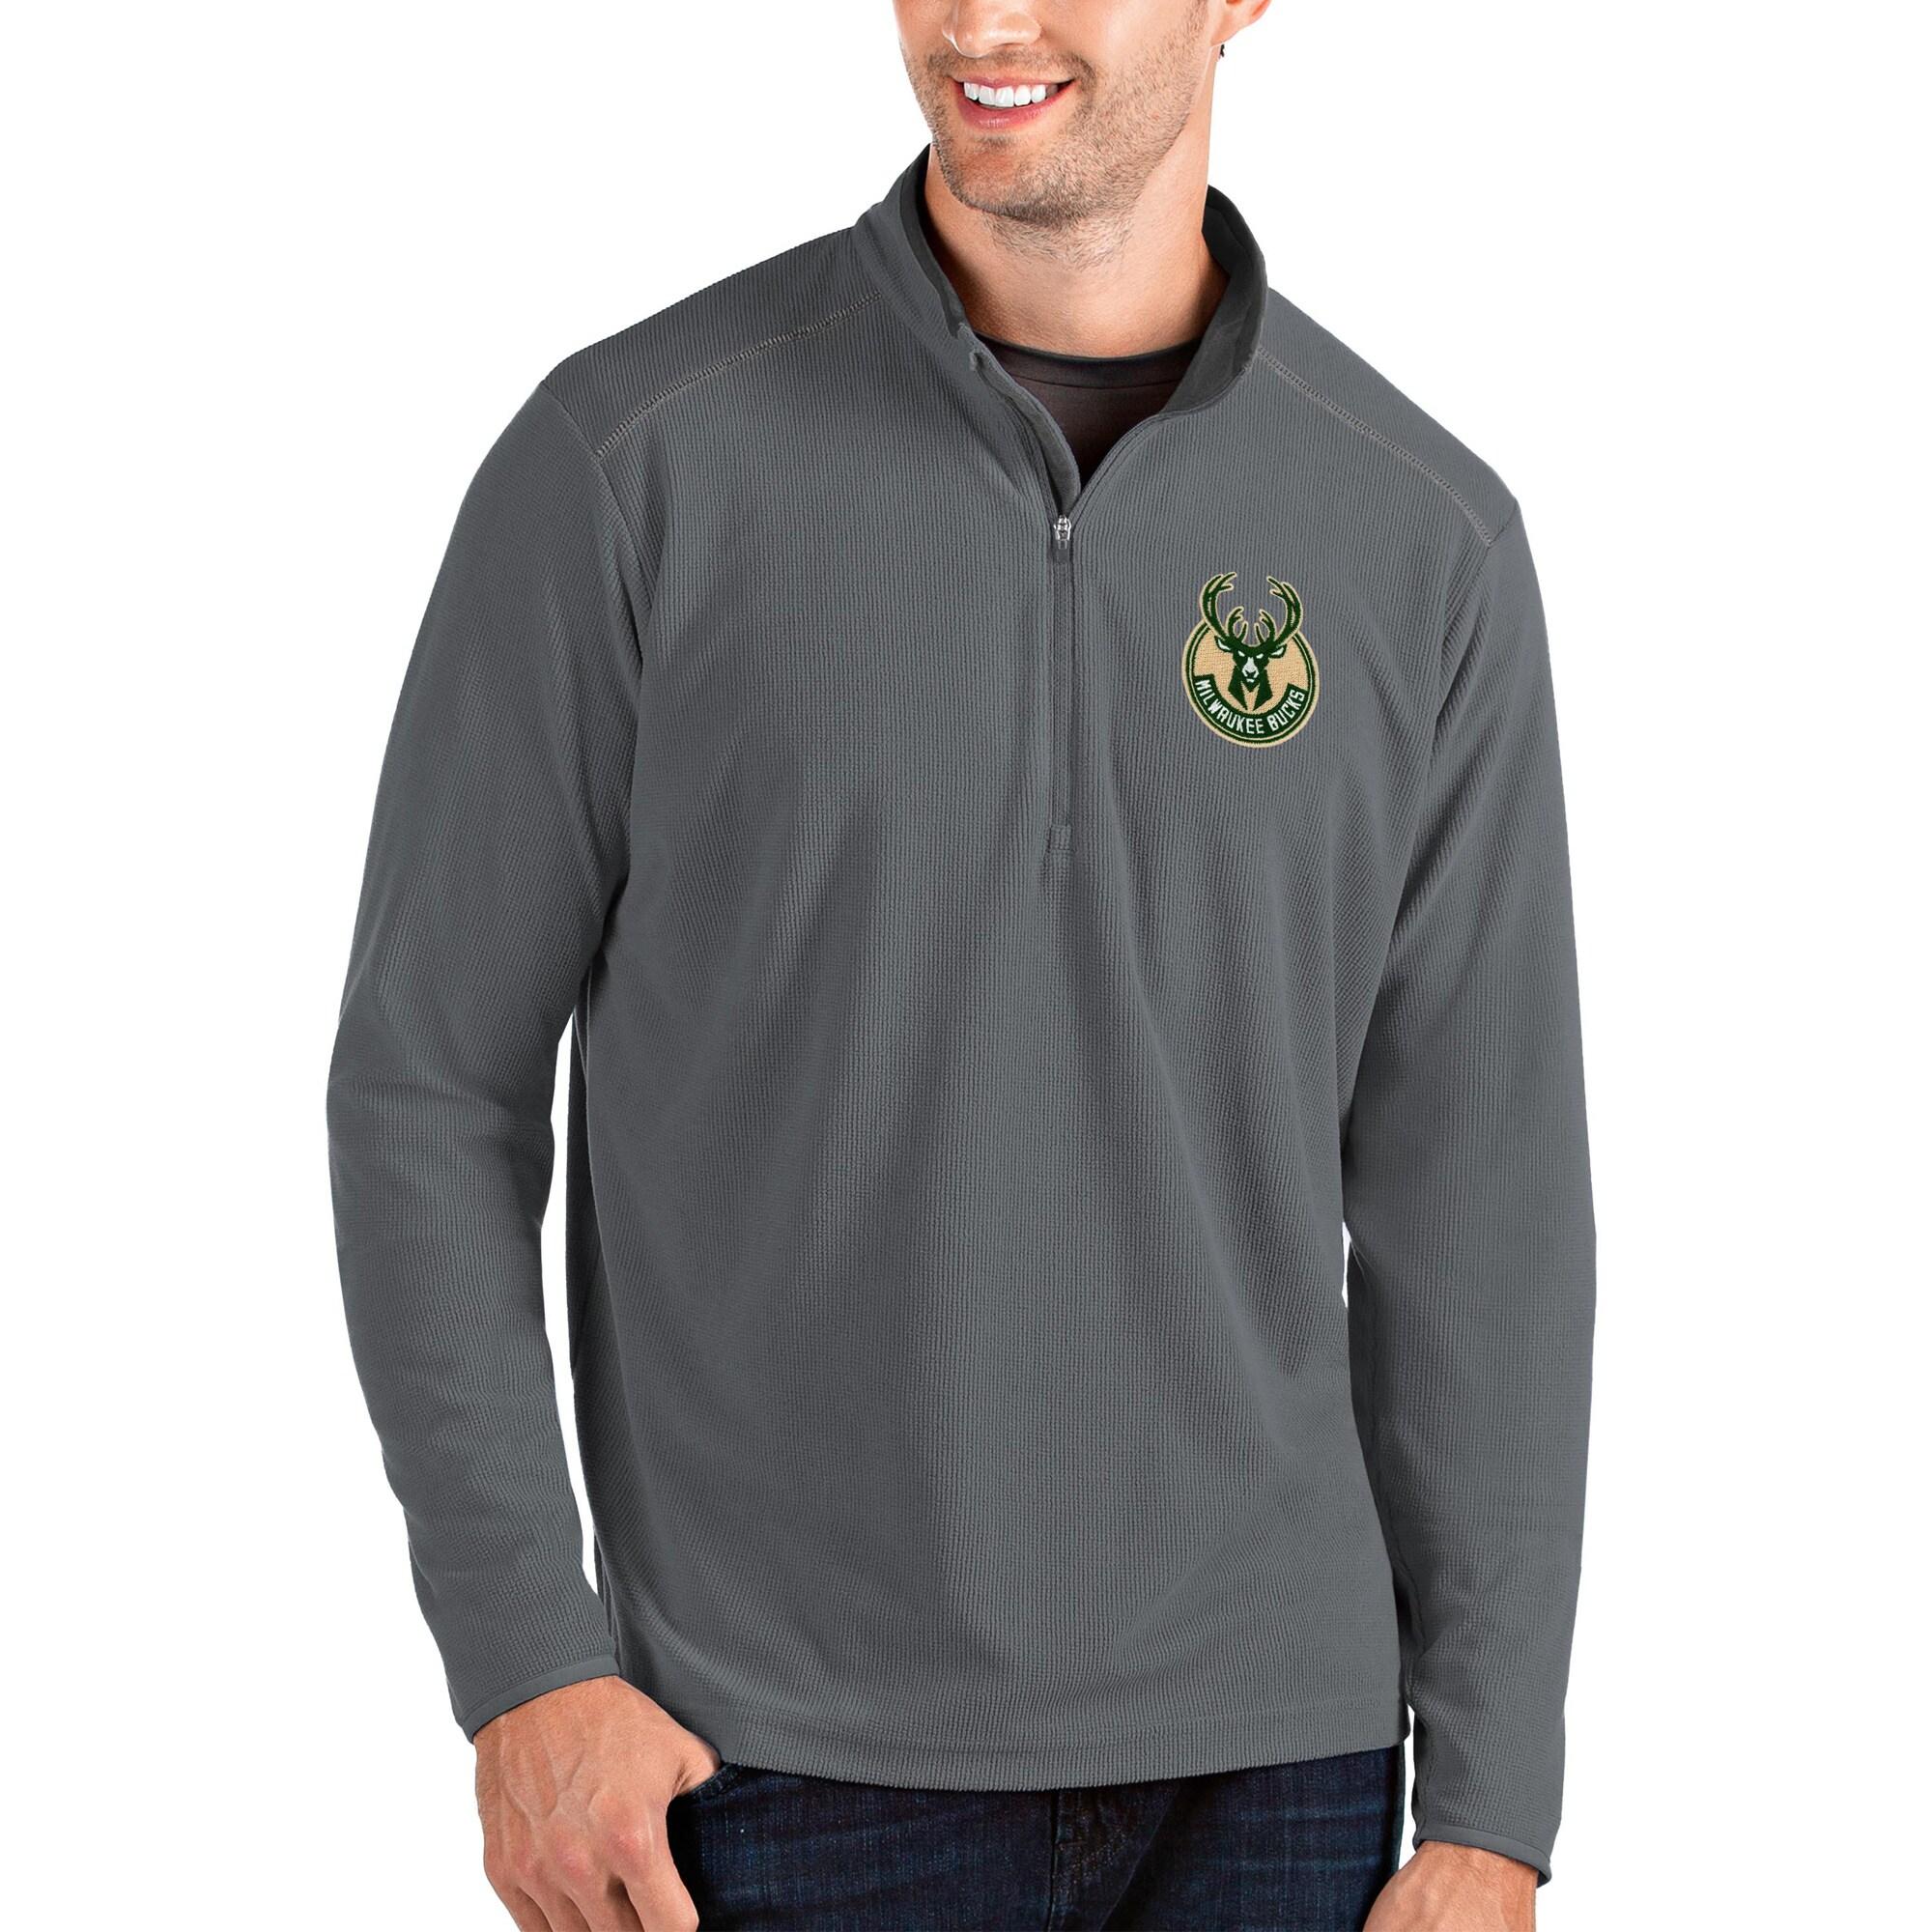 Milwaukee Bucks Antigua Glacier Quarter-Zip Pullover Jacket - Charcoal/Gray